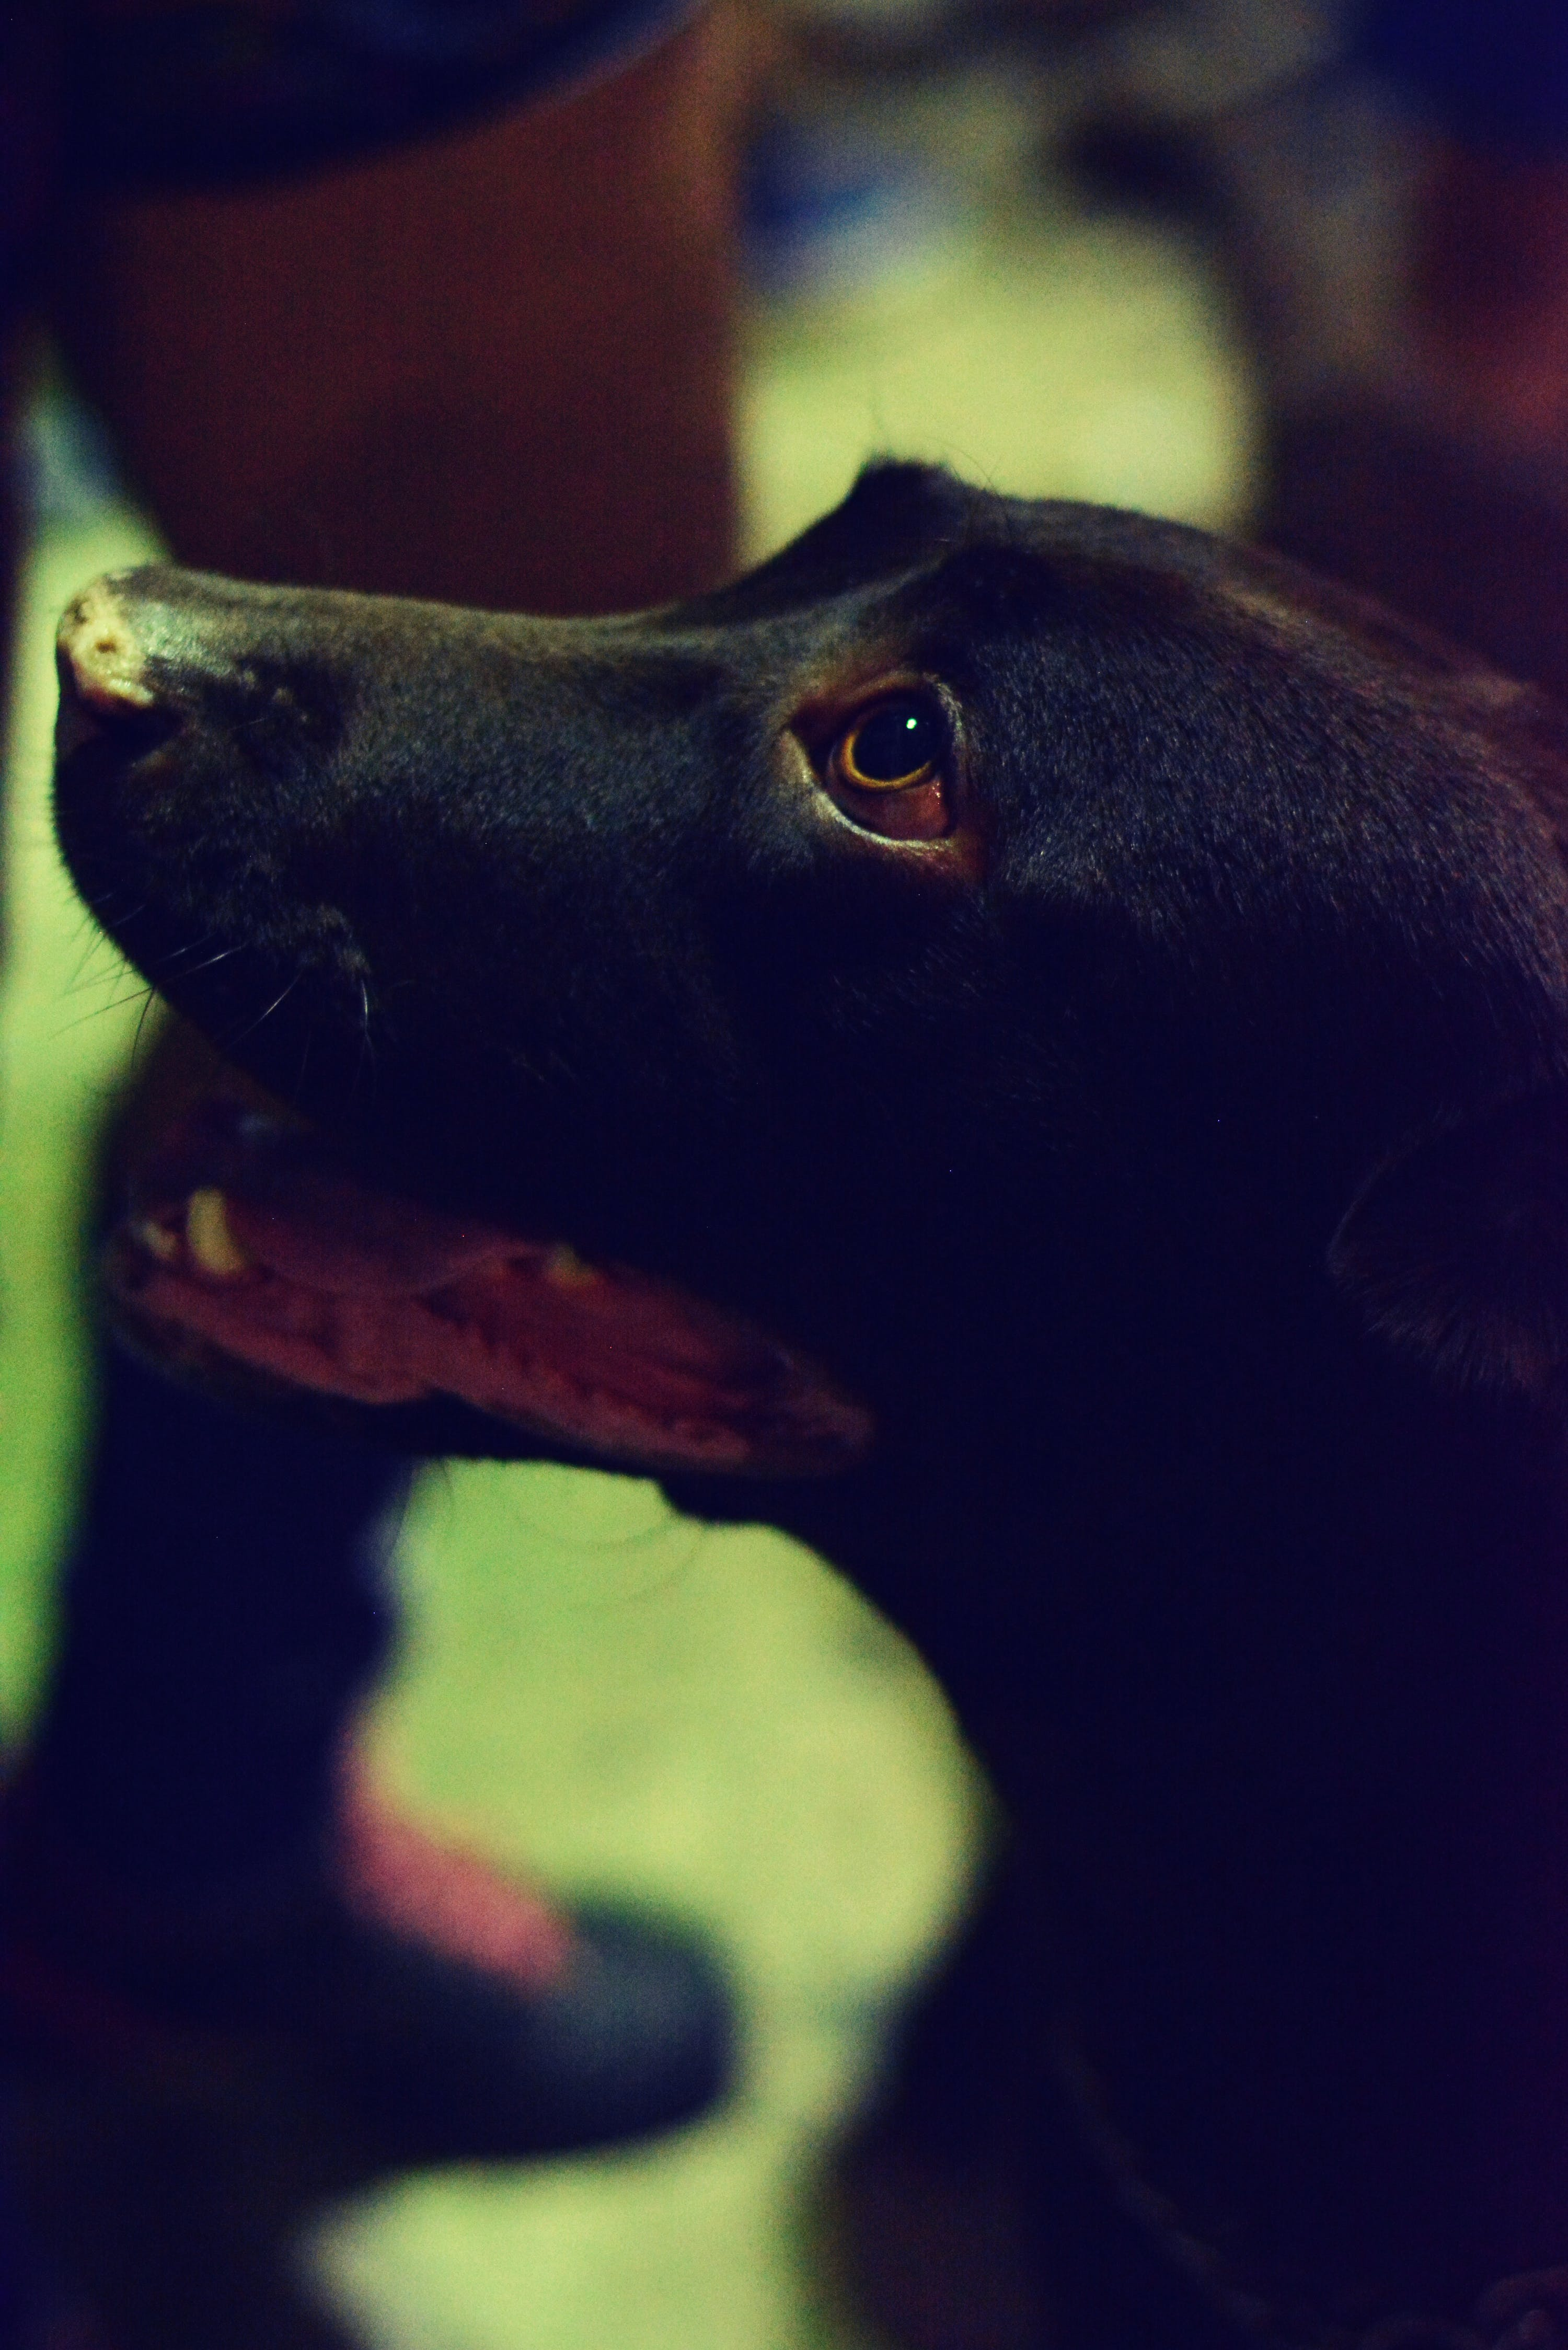 Free stock photo of animal, cute animals, dog, dogs